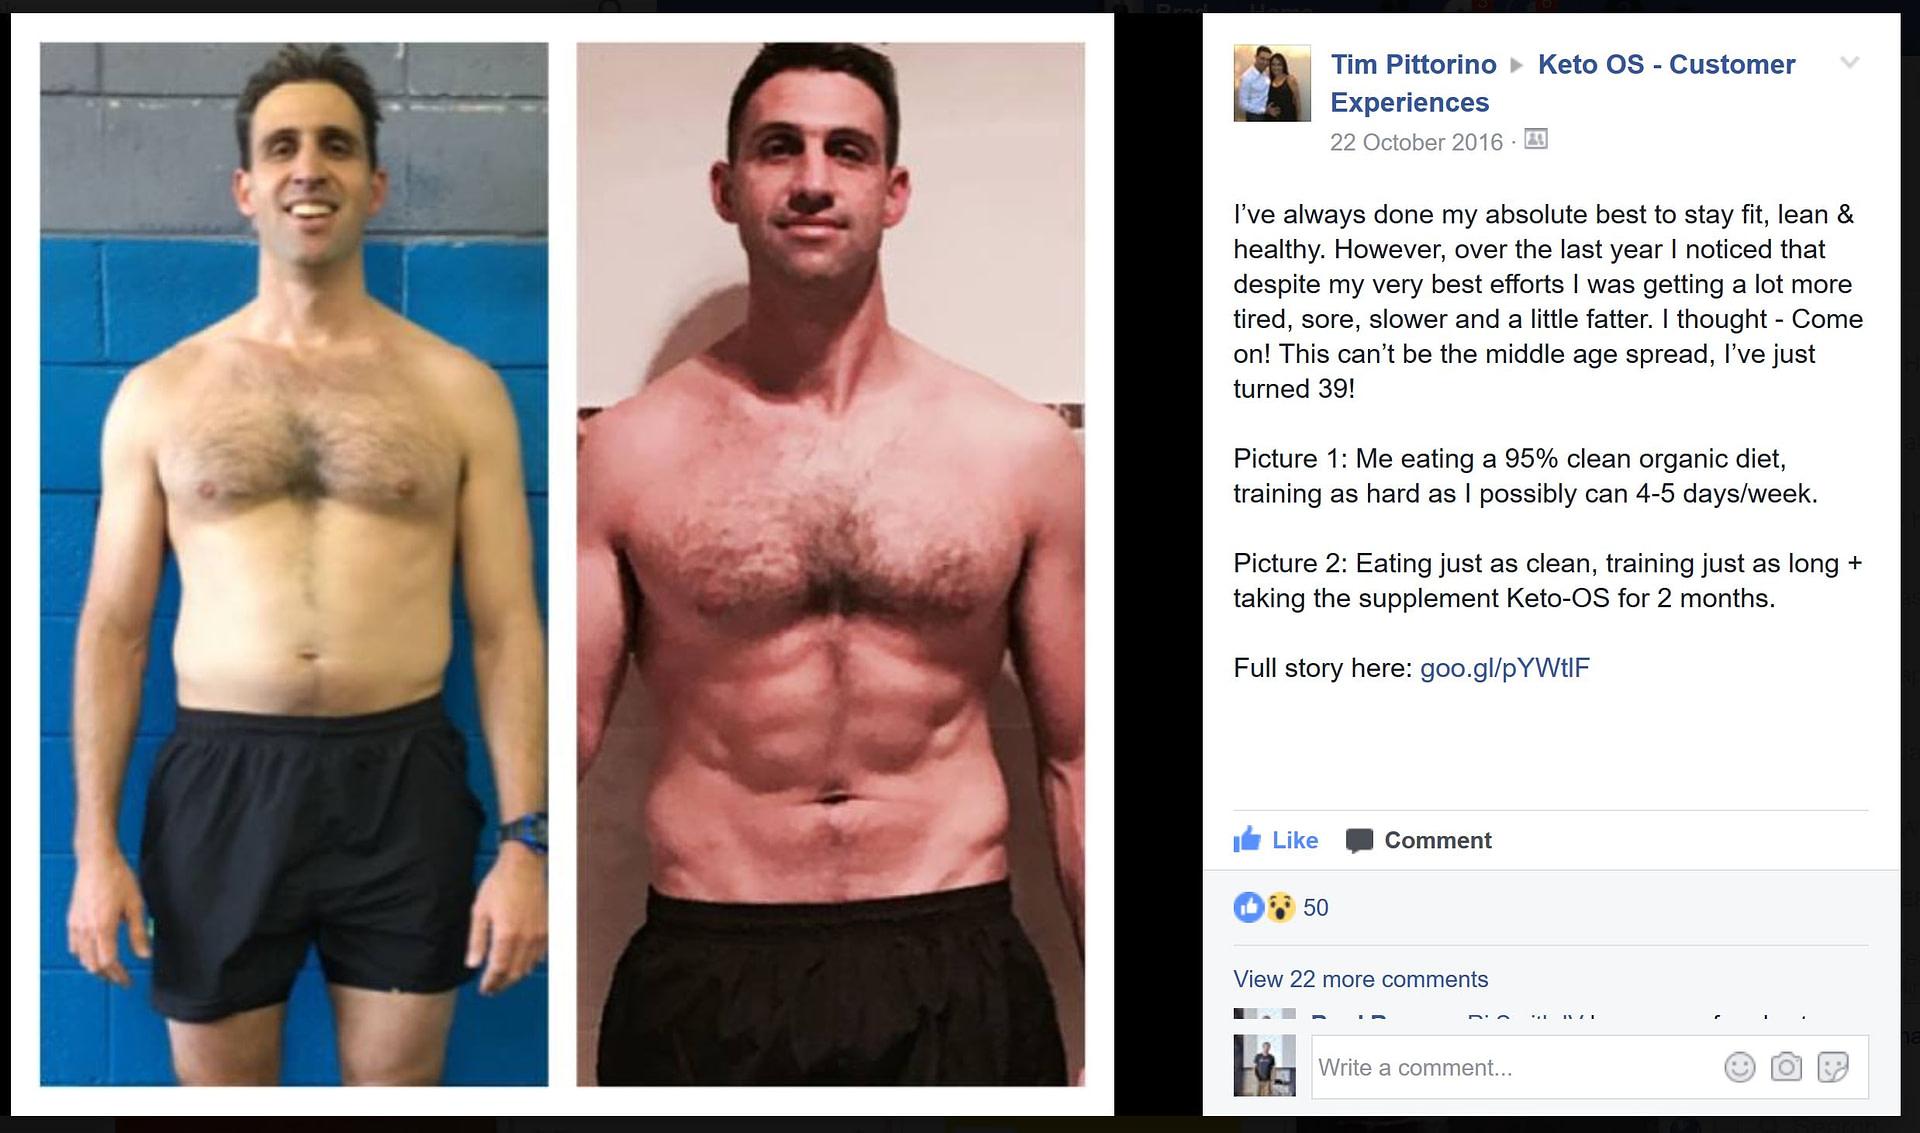 Fat Loss - Stregth Gain - Performance - CrossFit - Tim Pittorino